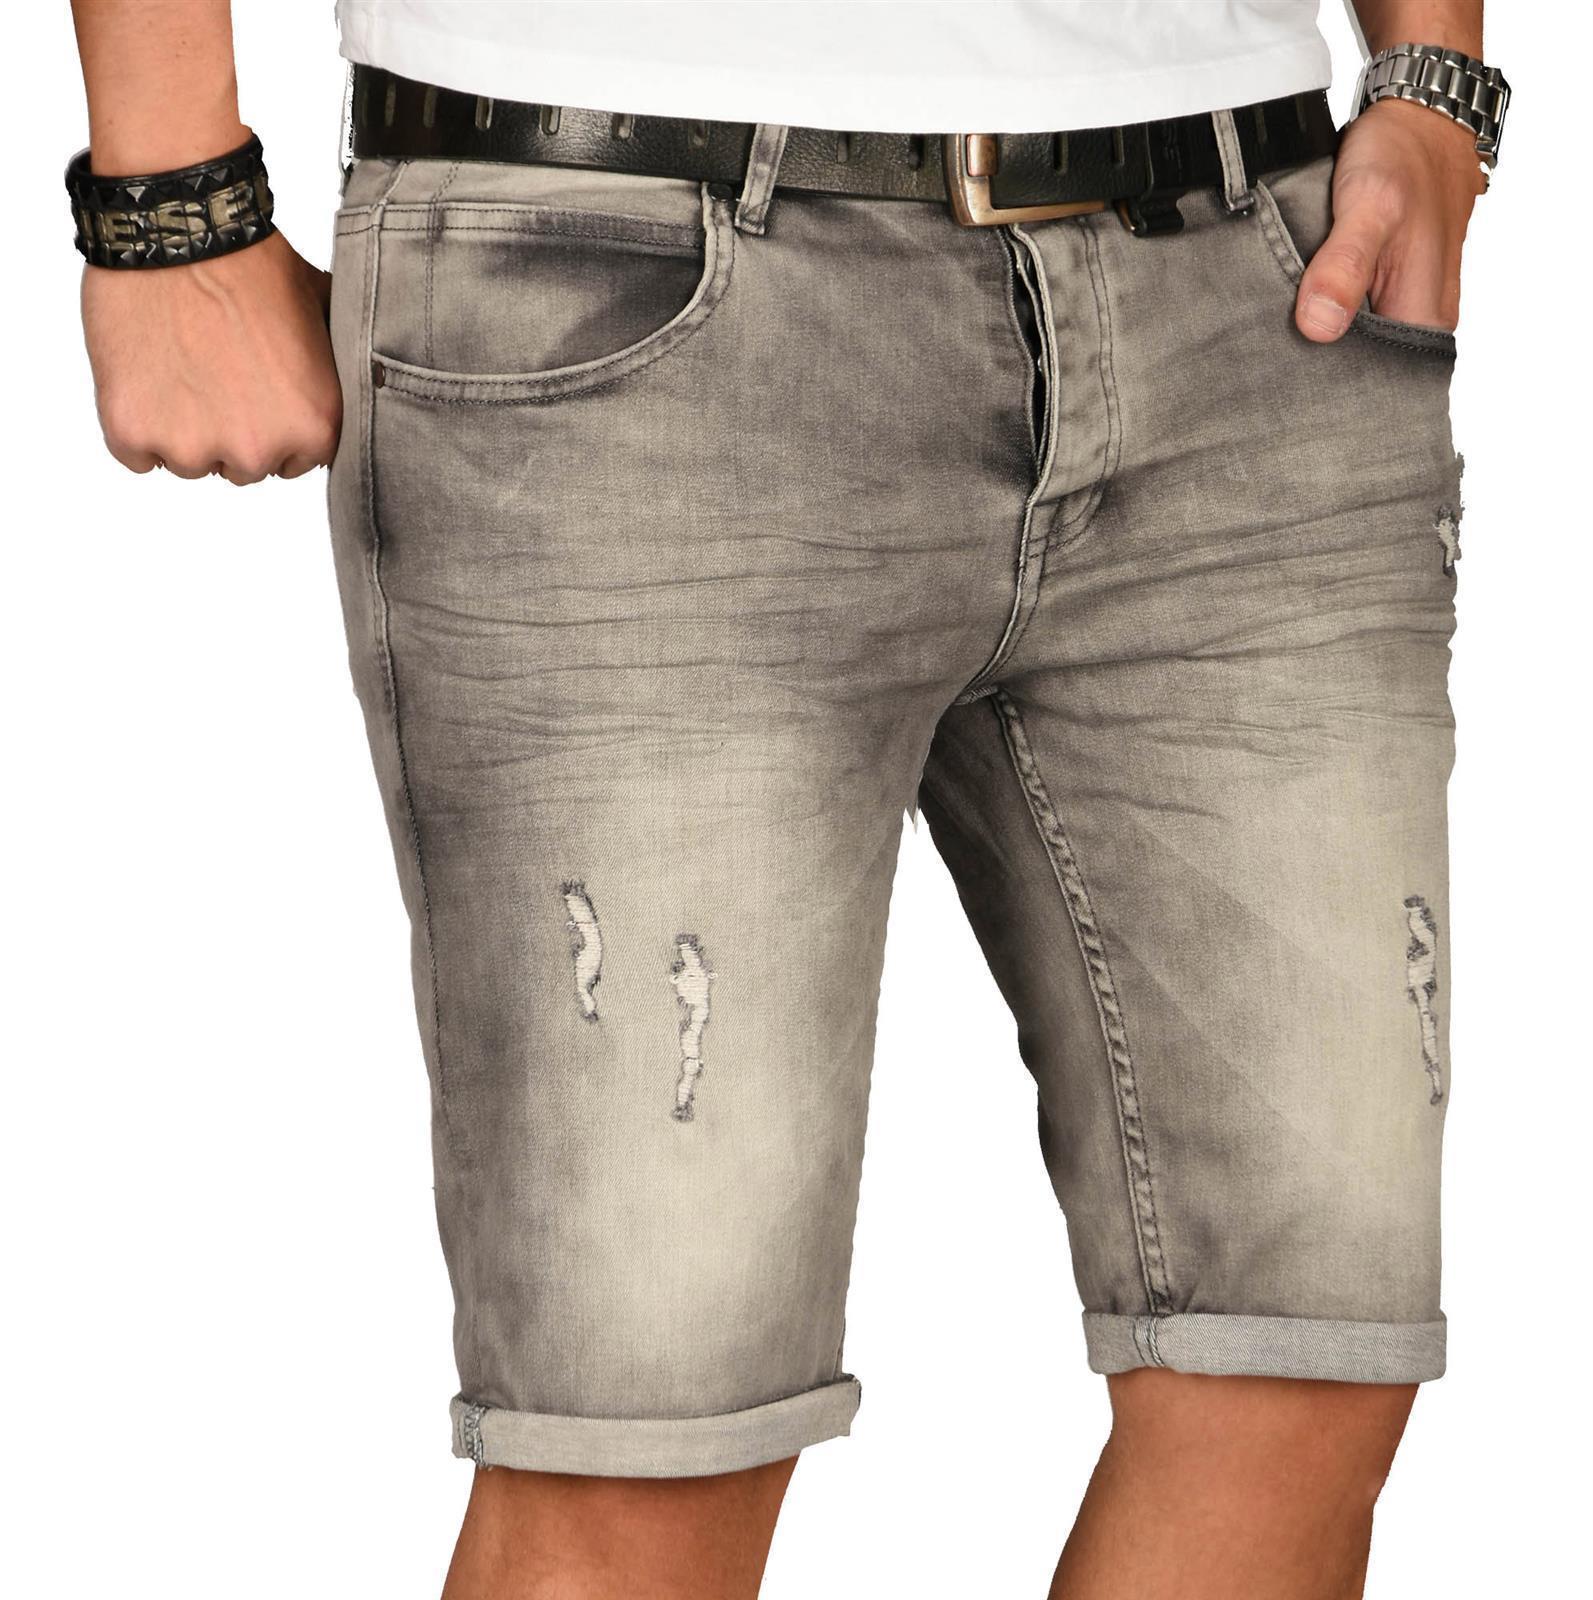 A-Salvarini-Herren-Designer-Jeans-Short-kurze-Hose-Slim-Sommer-Shorts-Washed Indexbild 43